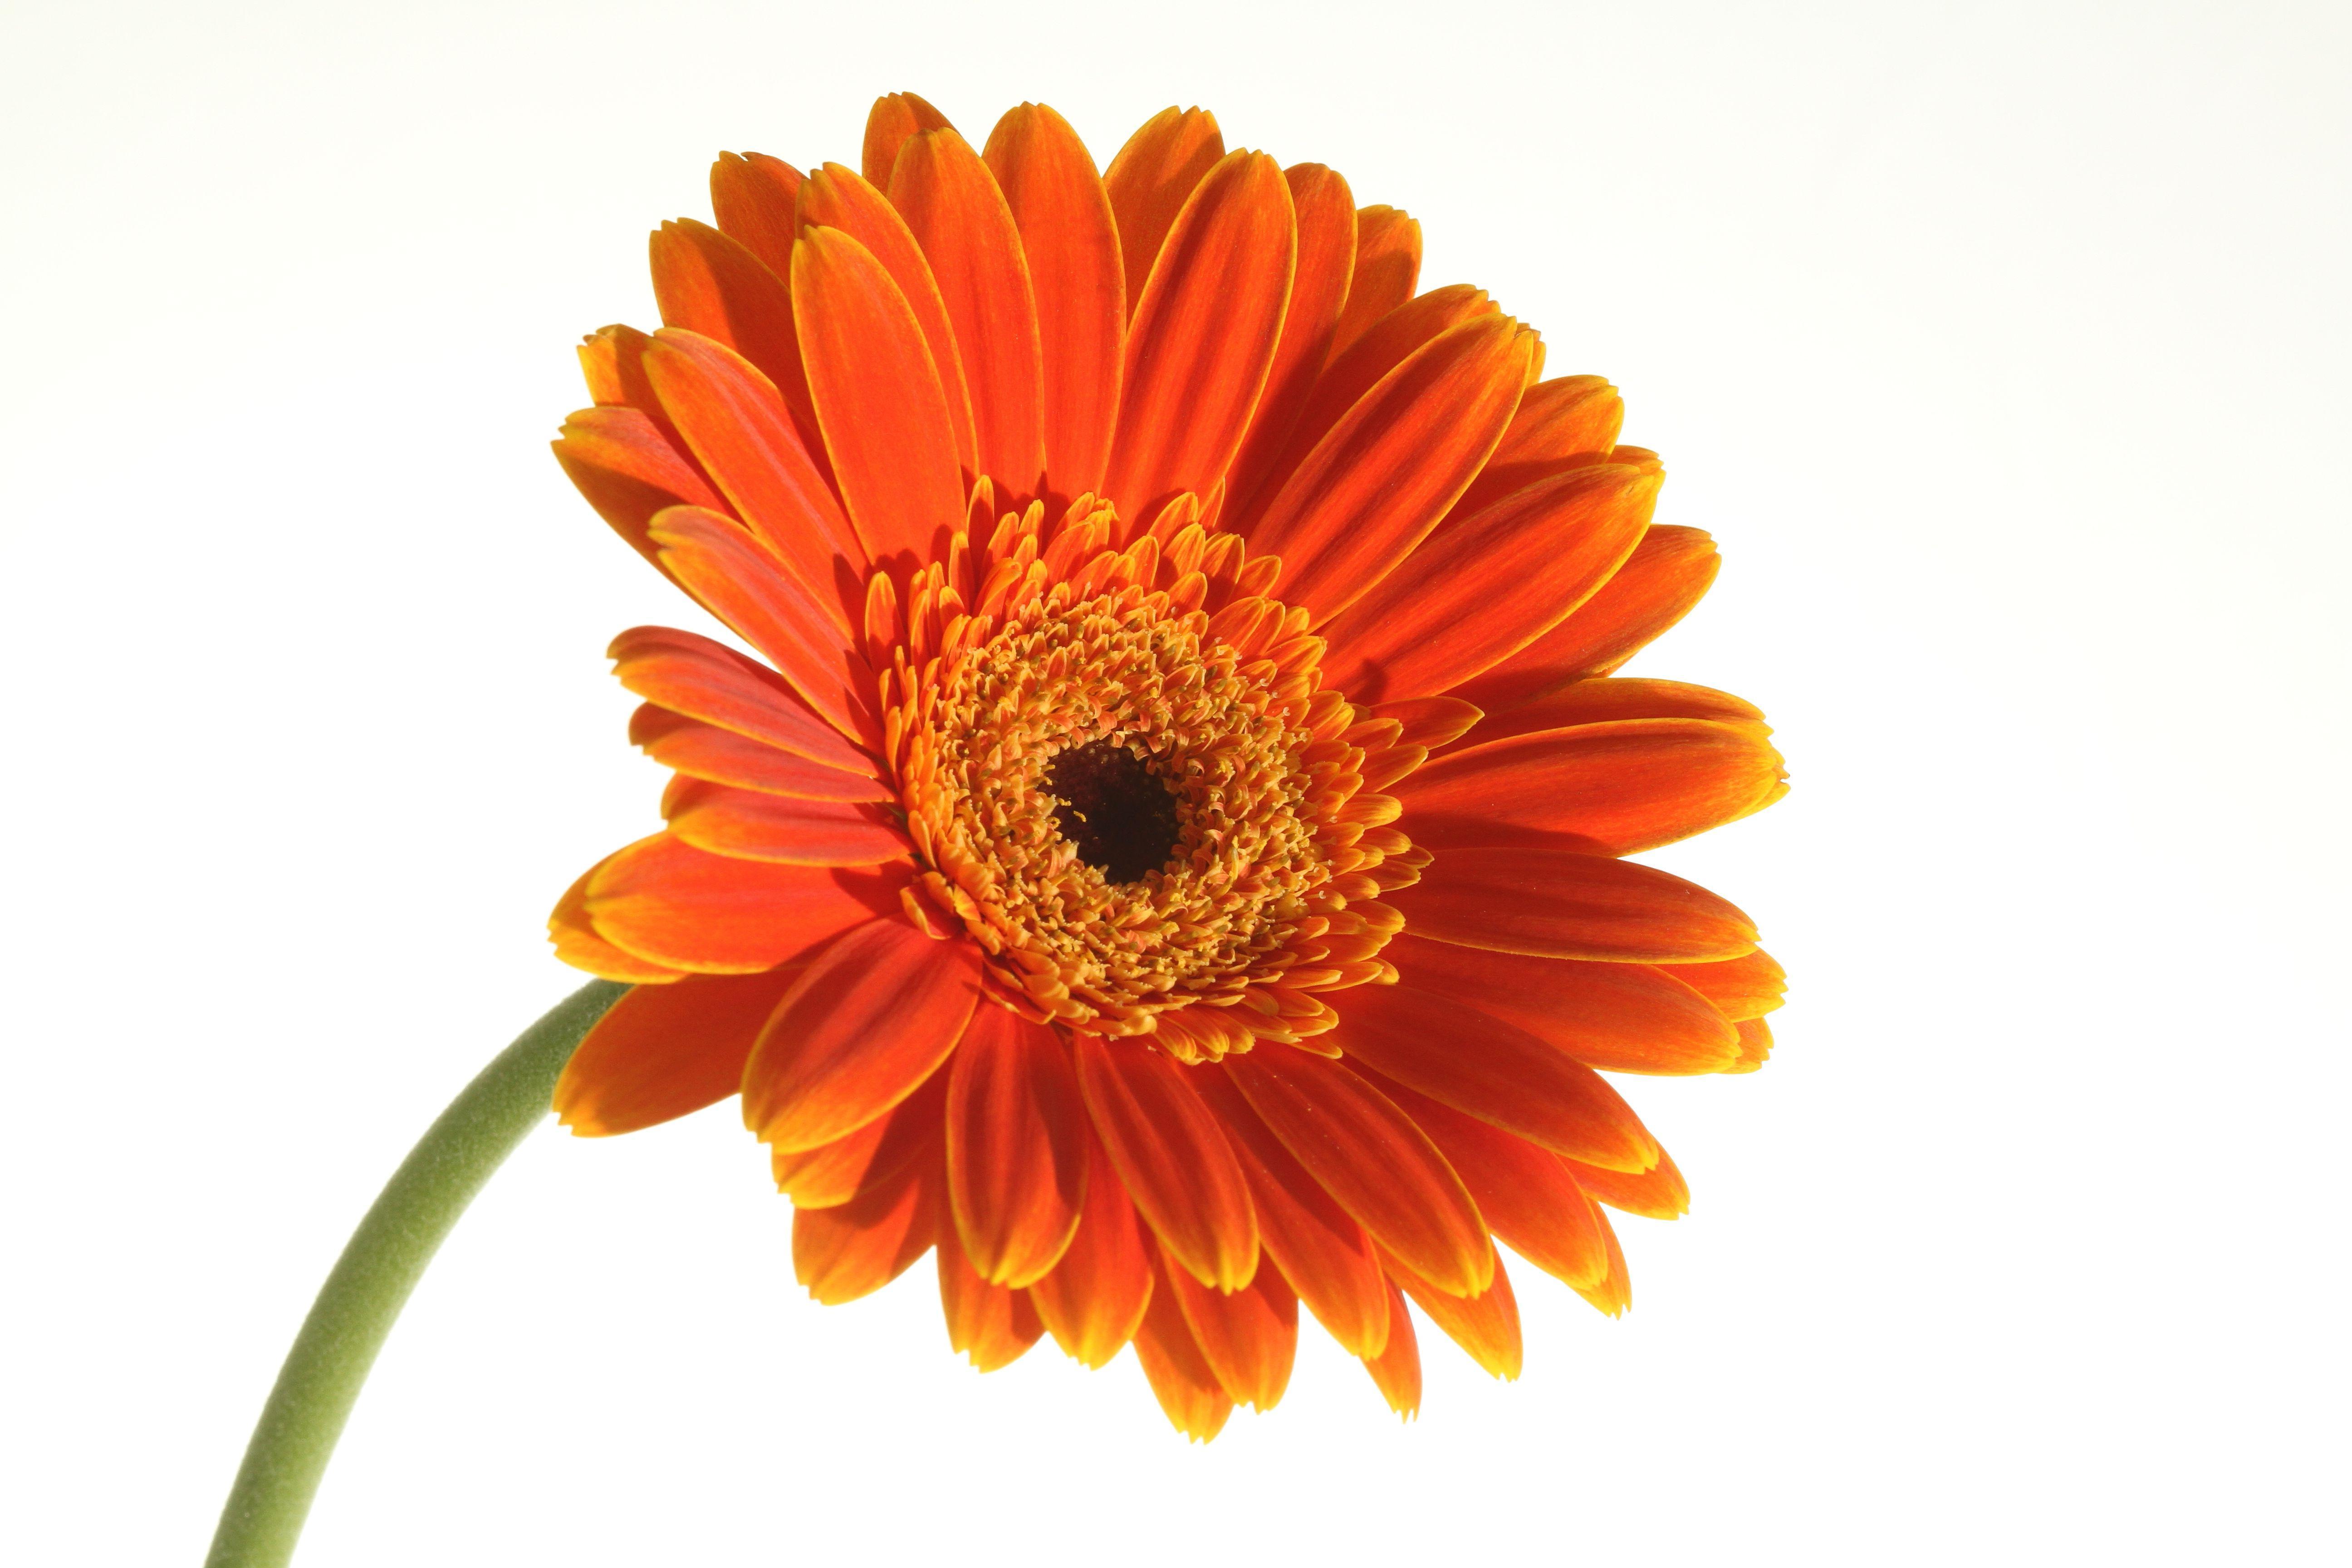 Best Orange Daisy Clip Art Design » Free Vector Art, Images.